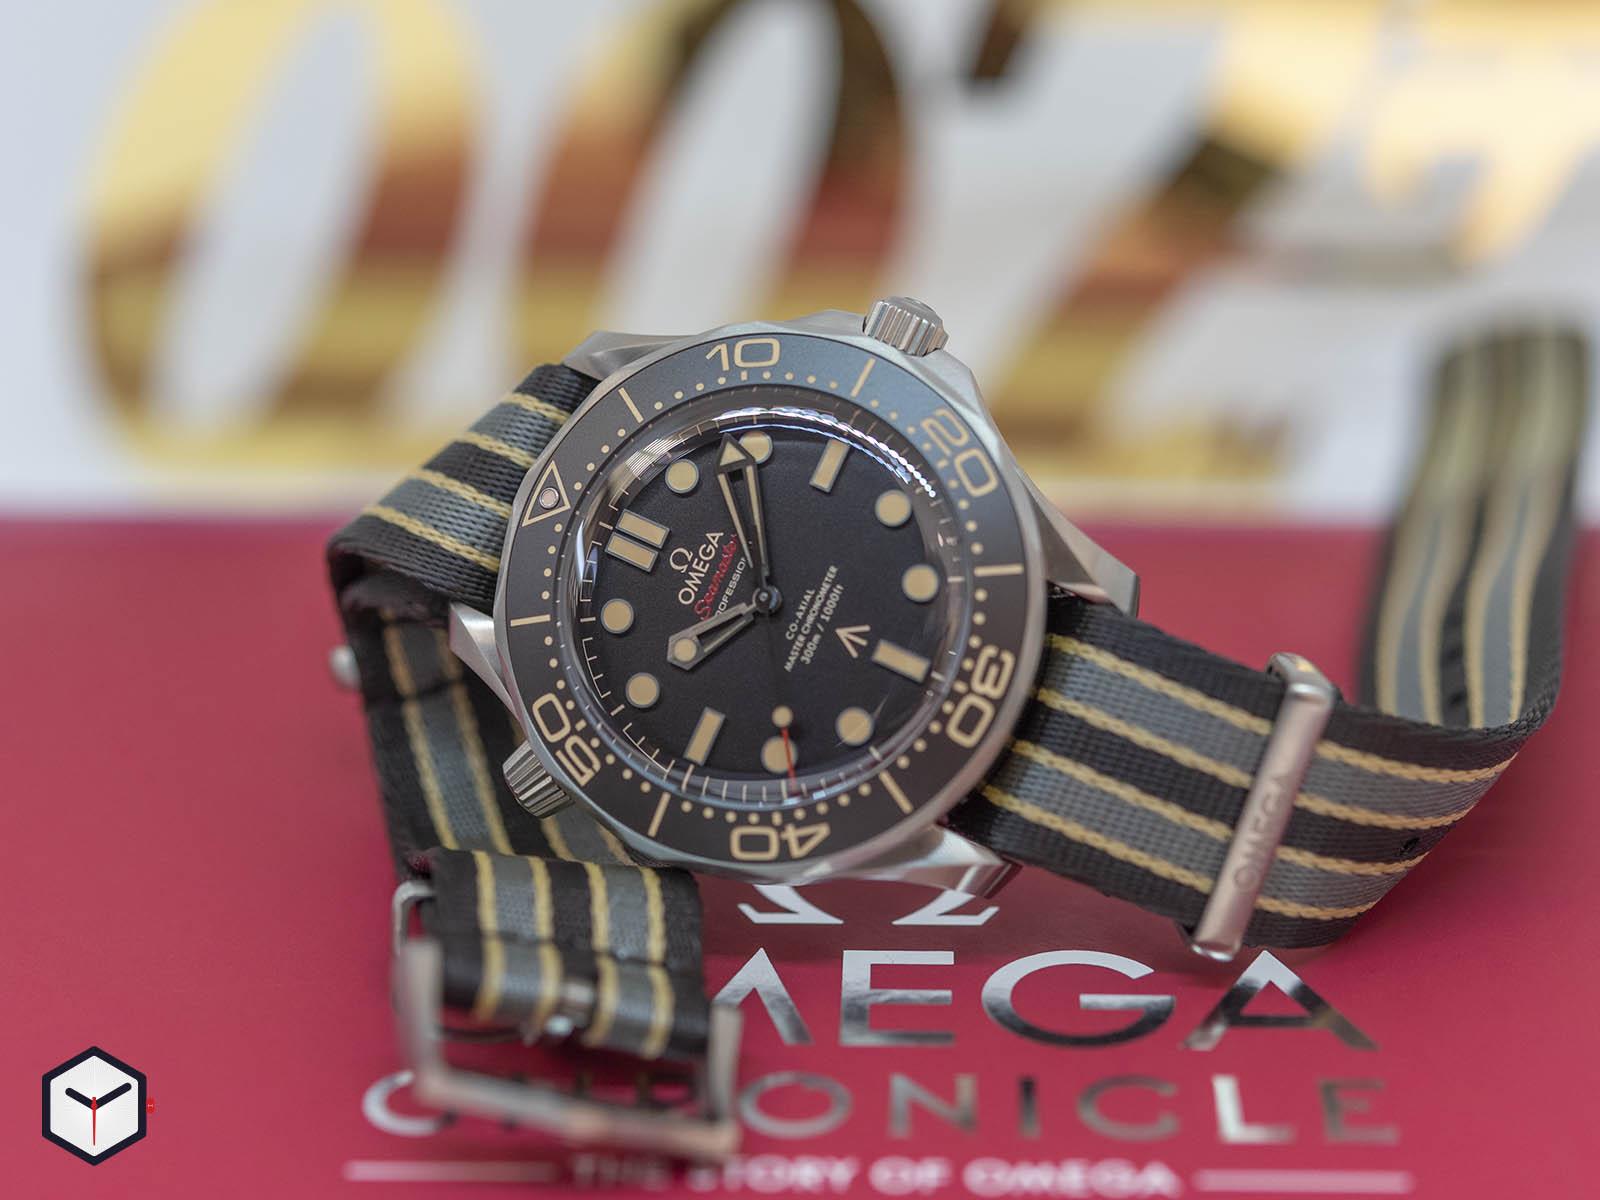 omega-seamaster-diver-300m-007-edition-2.jpg